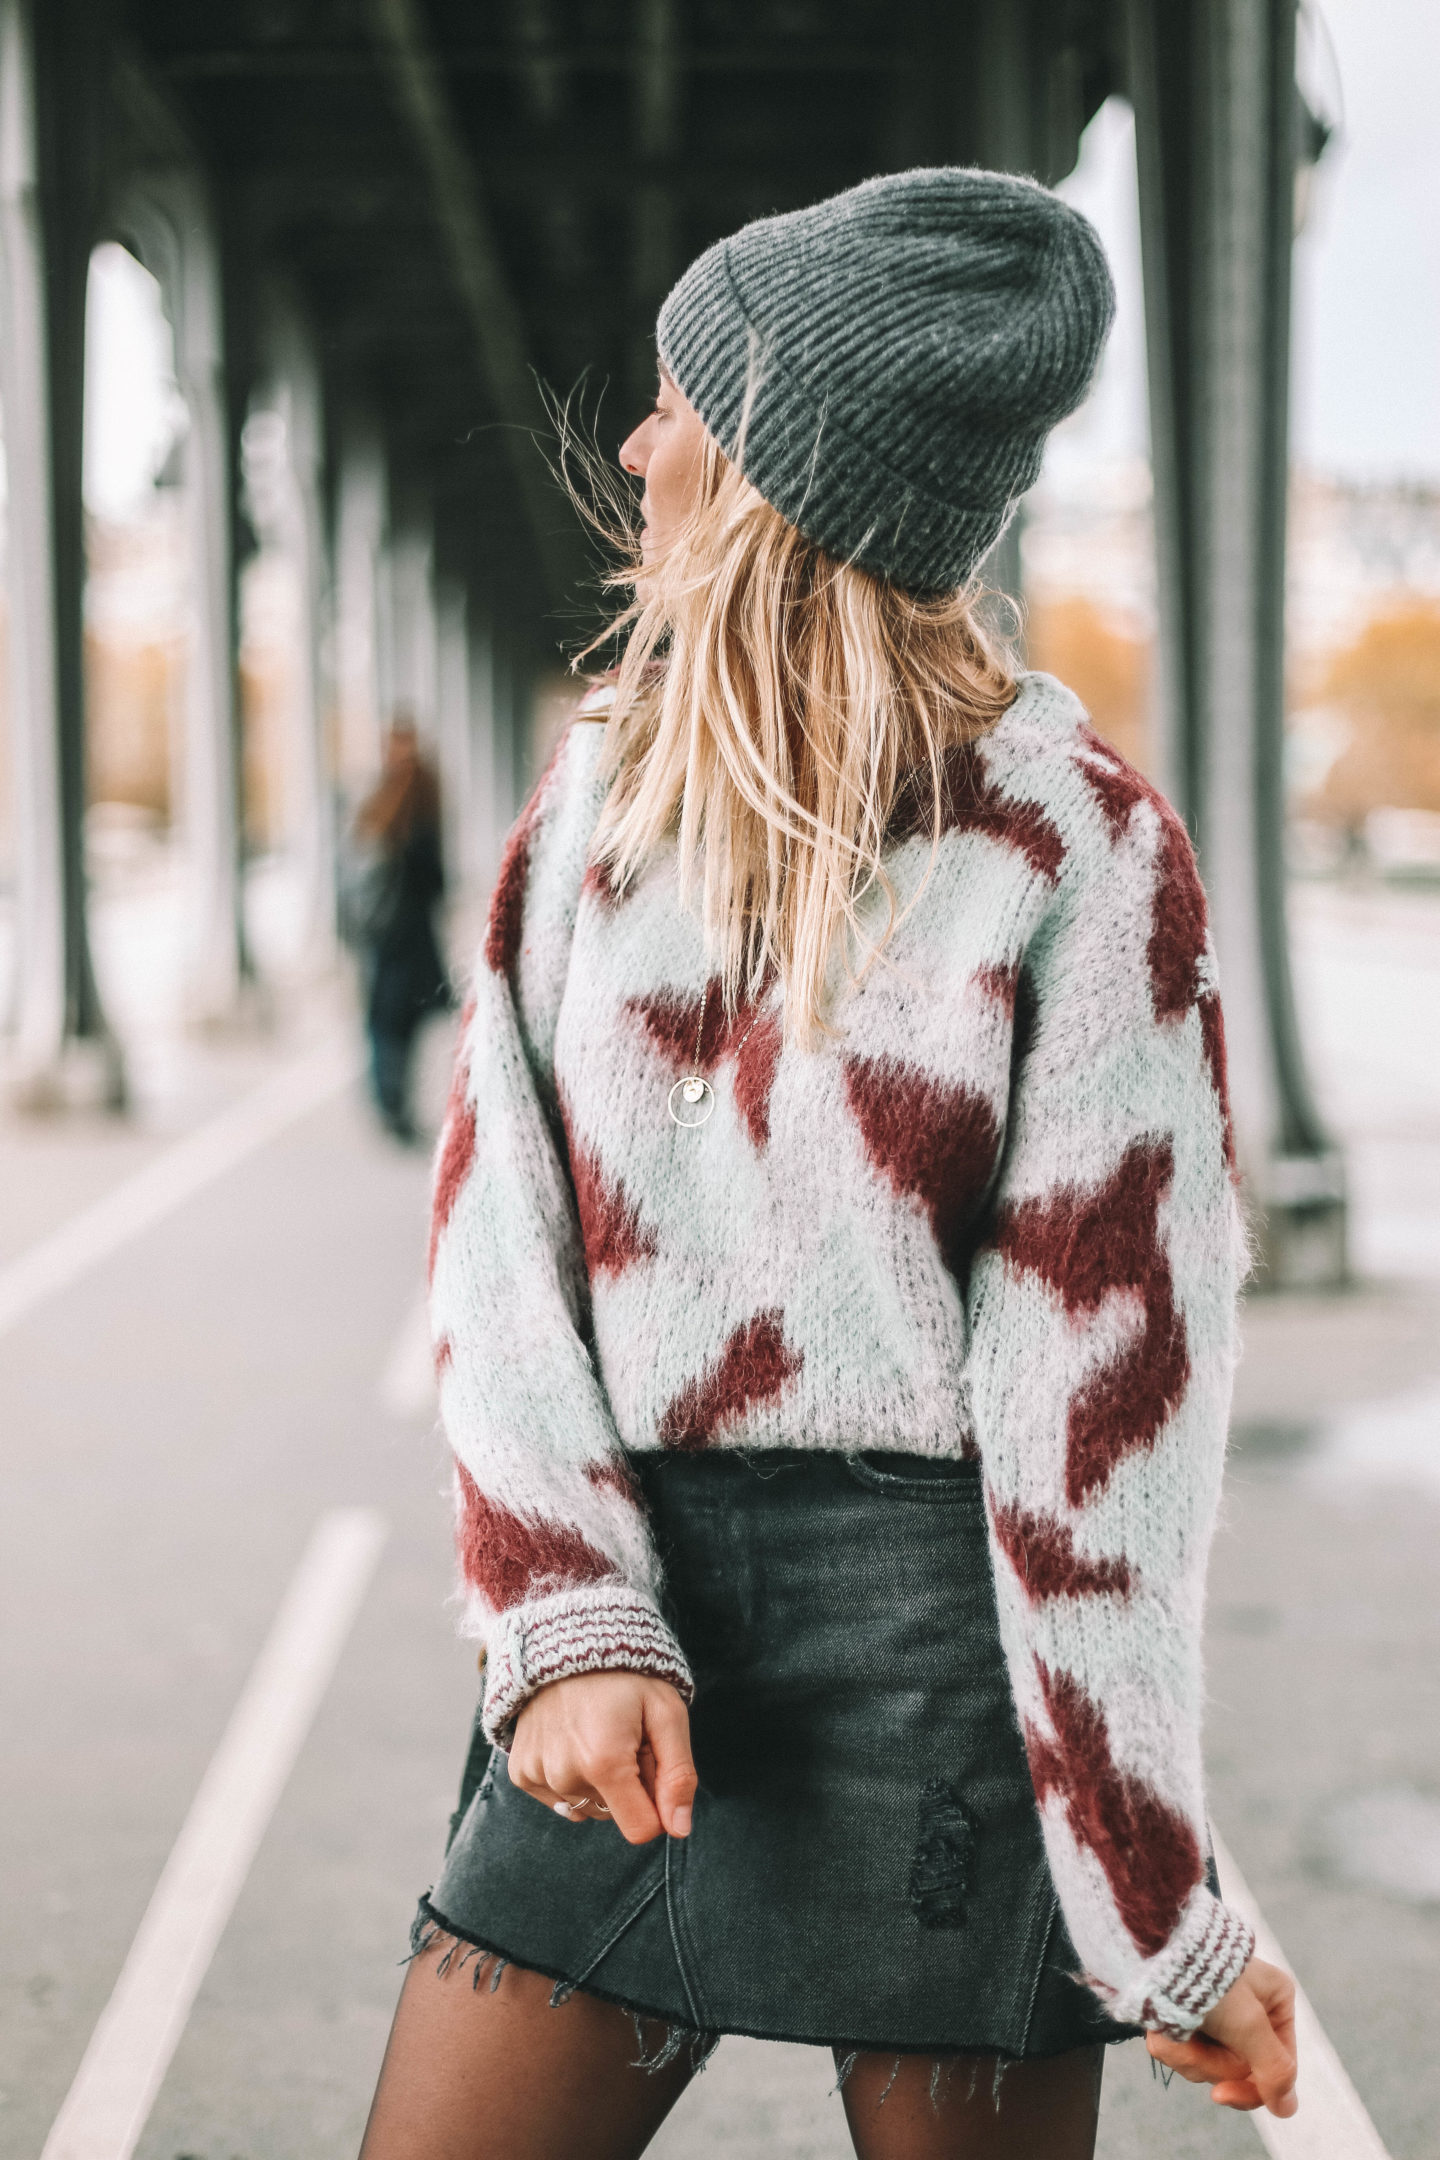 Bonnet gros Asos - Blondie baby blog mode et voyages